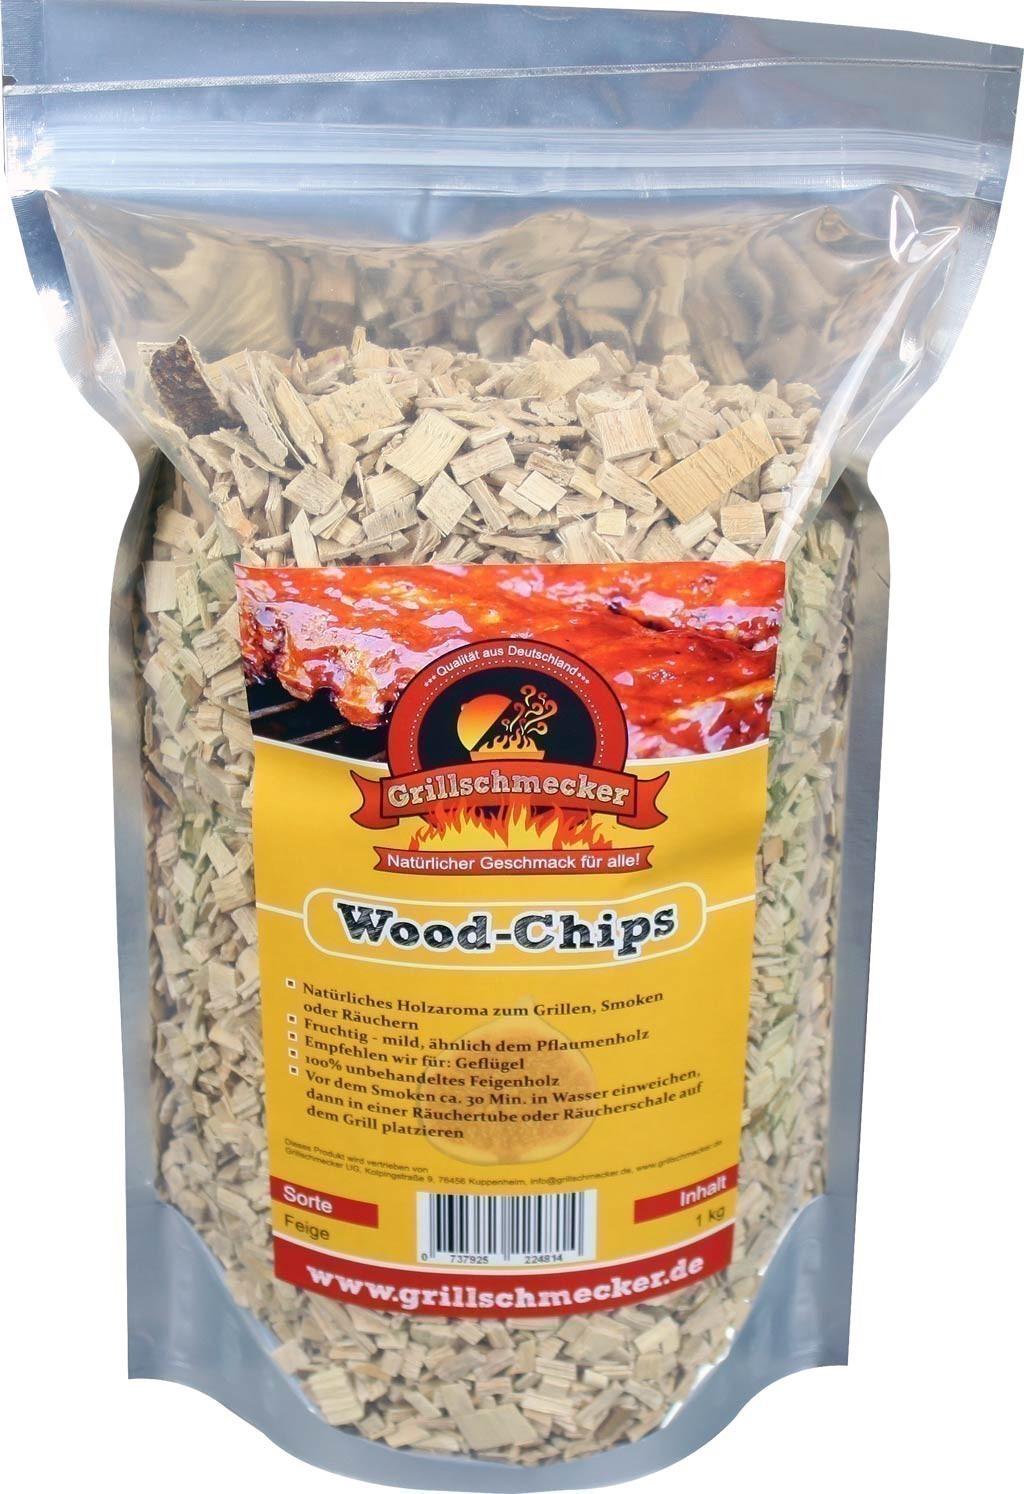 Räucherholz Wood-Chips Feige 1kg Bild 1